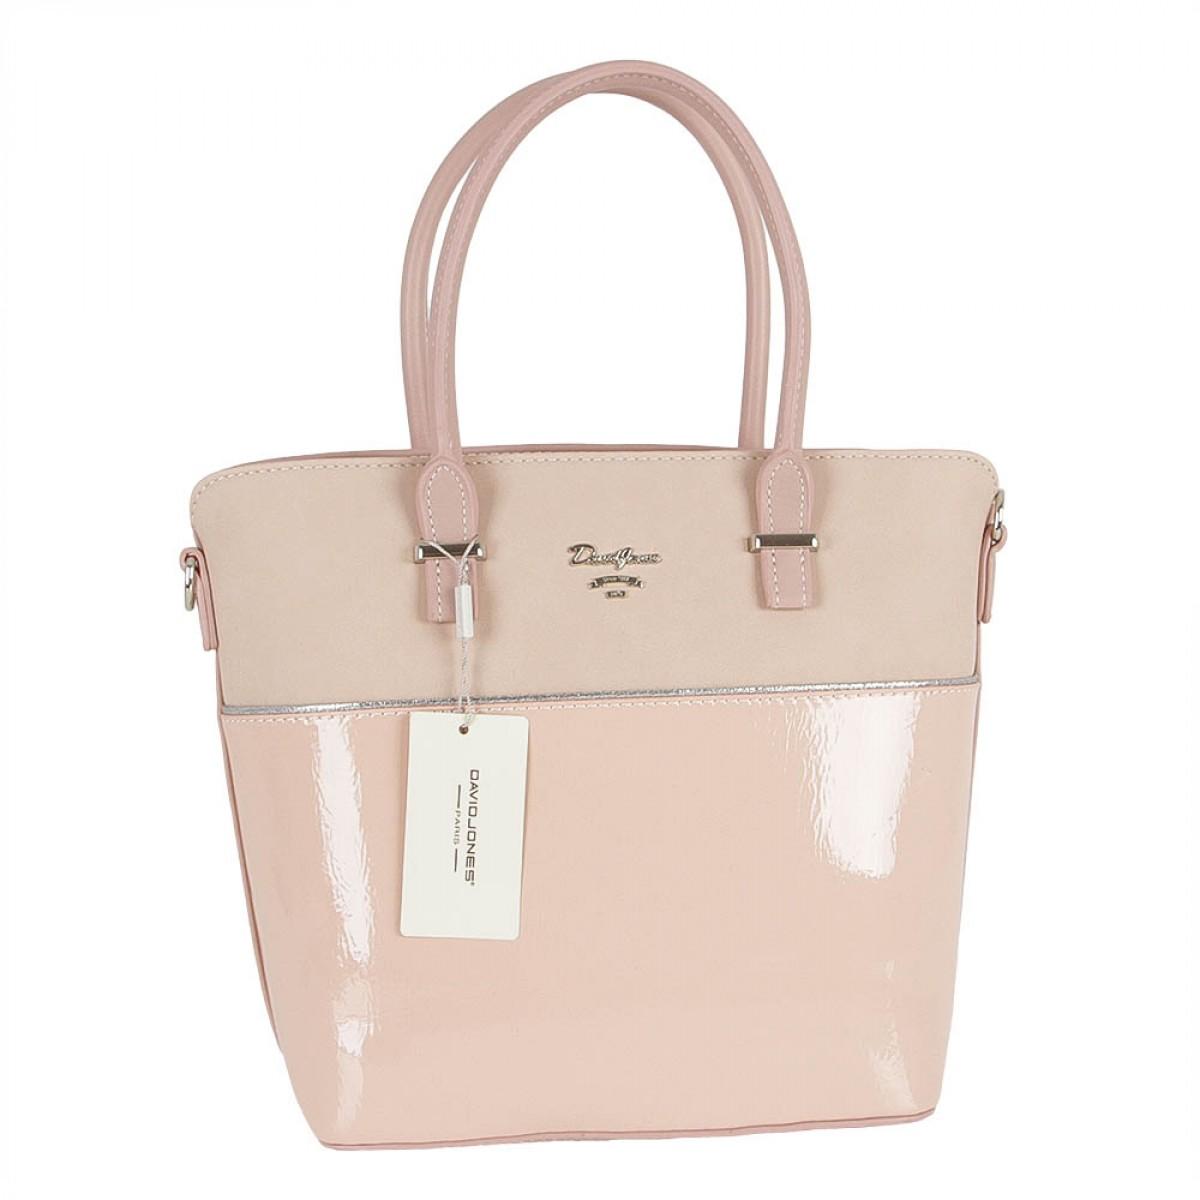 Жіноча сумка David Jones 5930-3 PINK